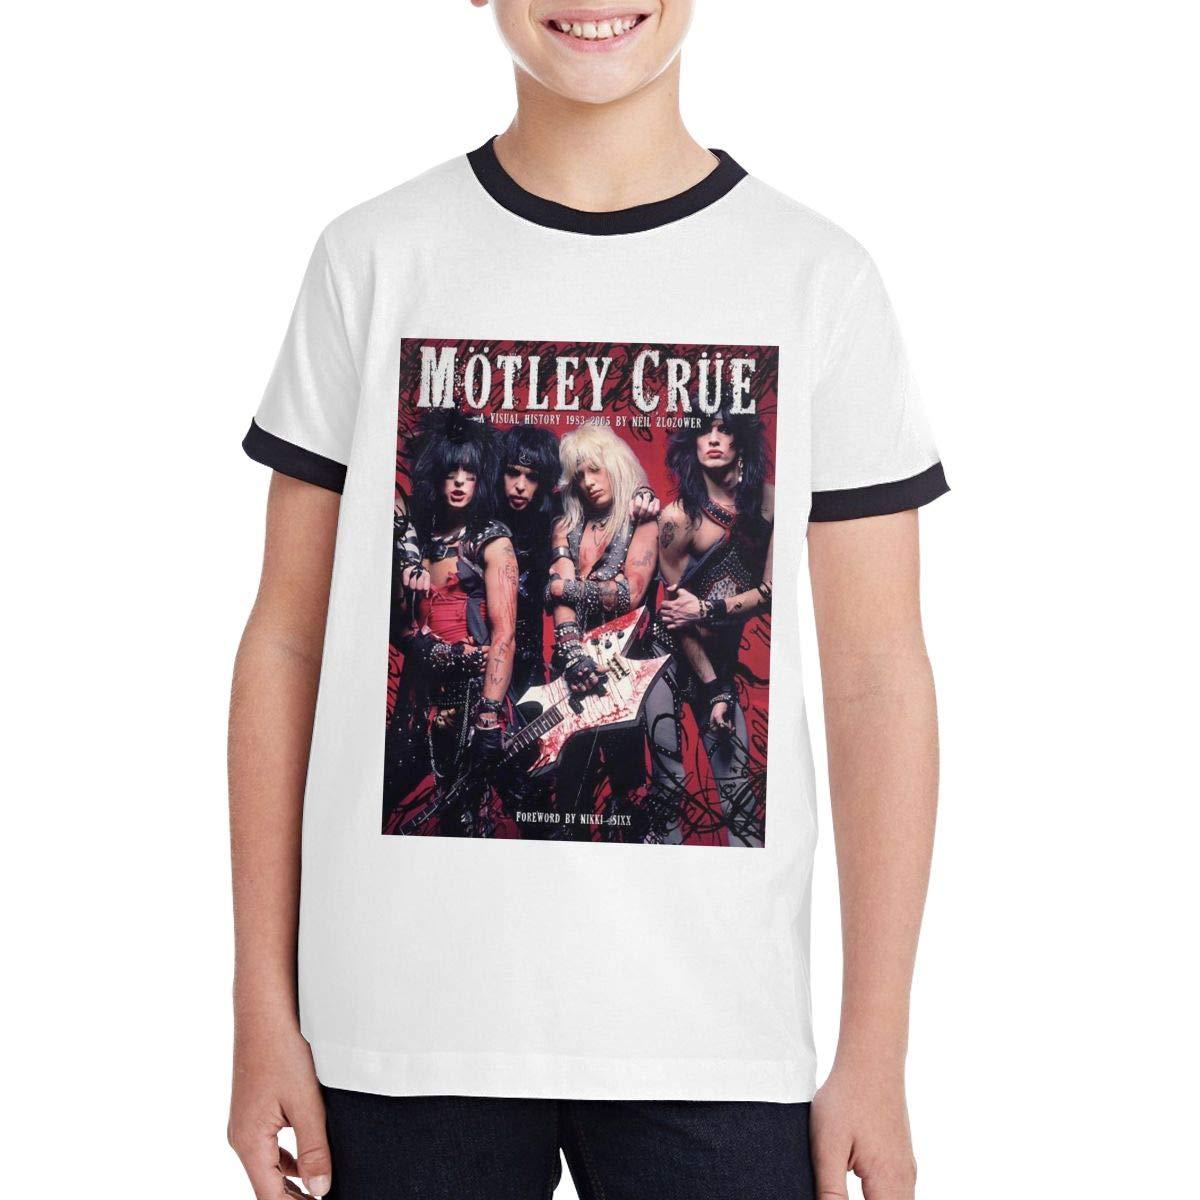 Cotton,Size:S-XL HELON K SUEEY Motley Crue Soft Teen BoyClassic Round Neck Teen Customized Contrast T-Shirt